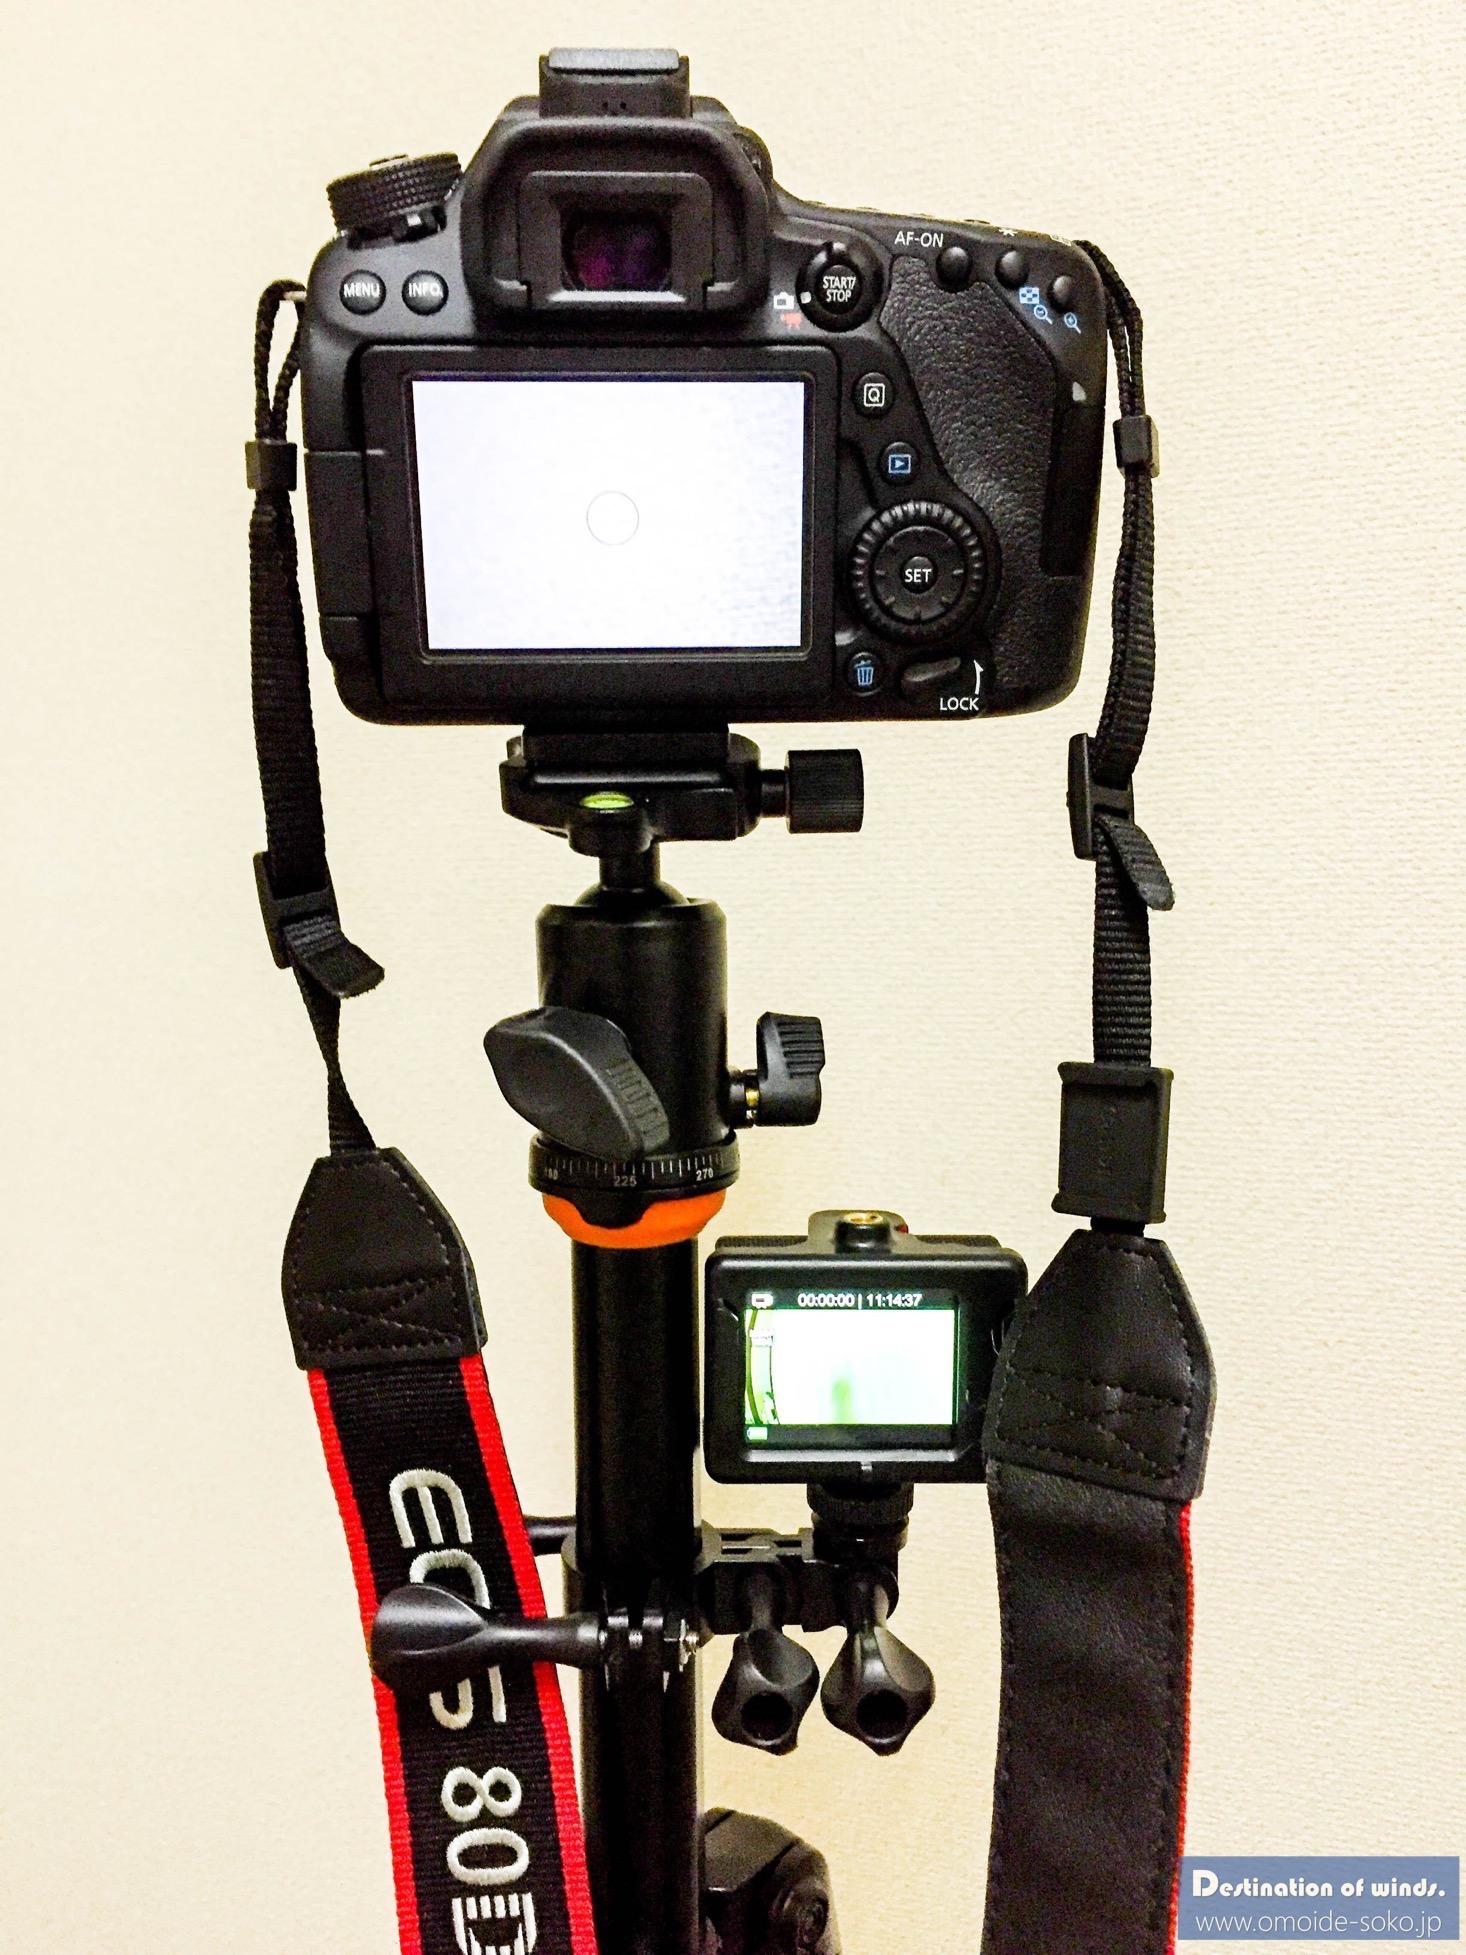 DualCamera02